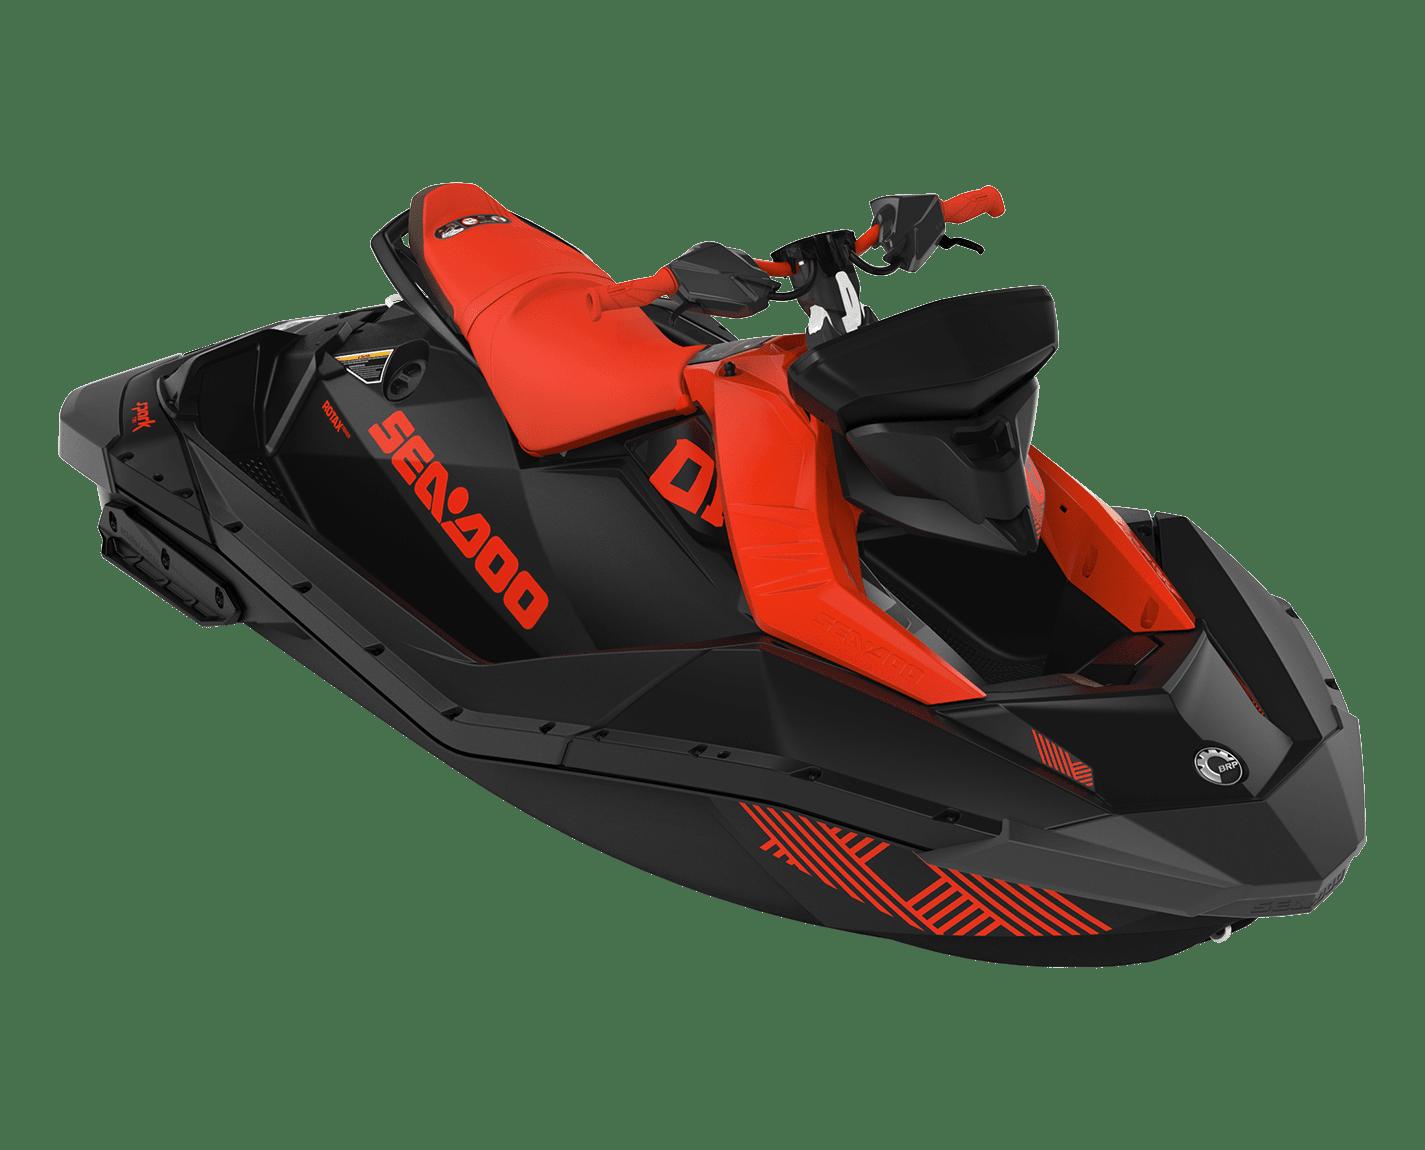 SPARK 2UP 90 IBR TRIXX RED BLACK 2022